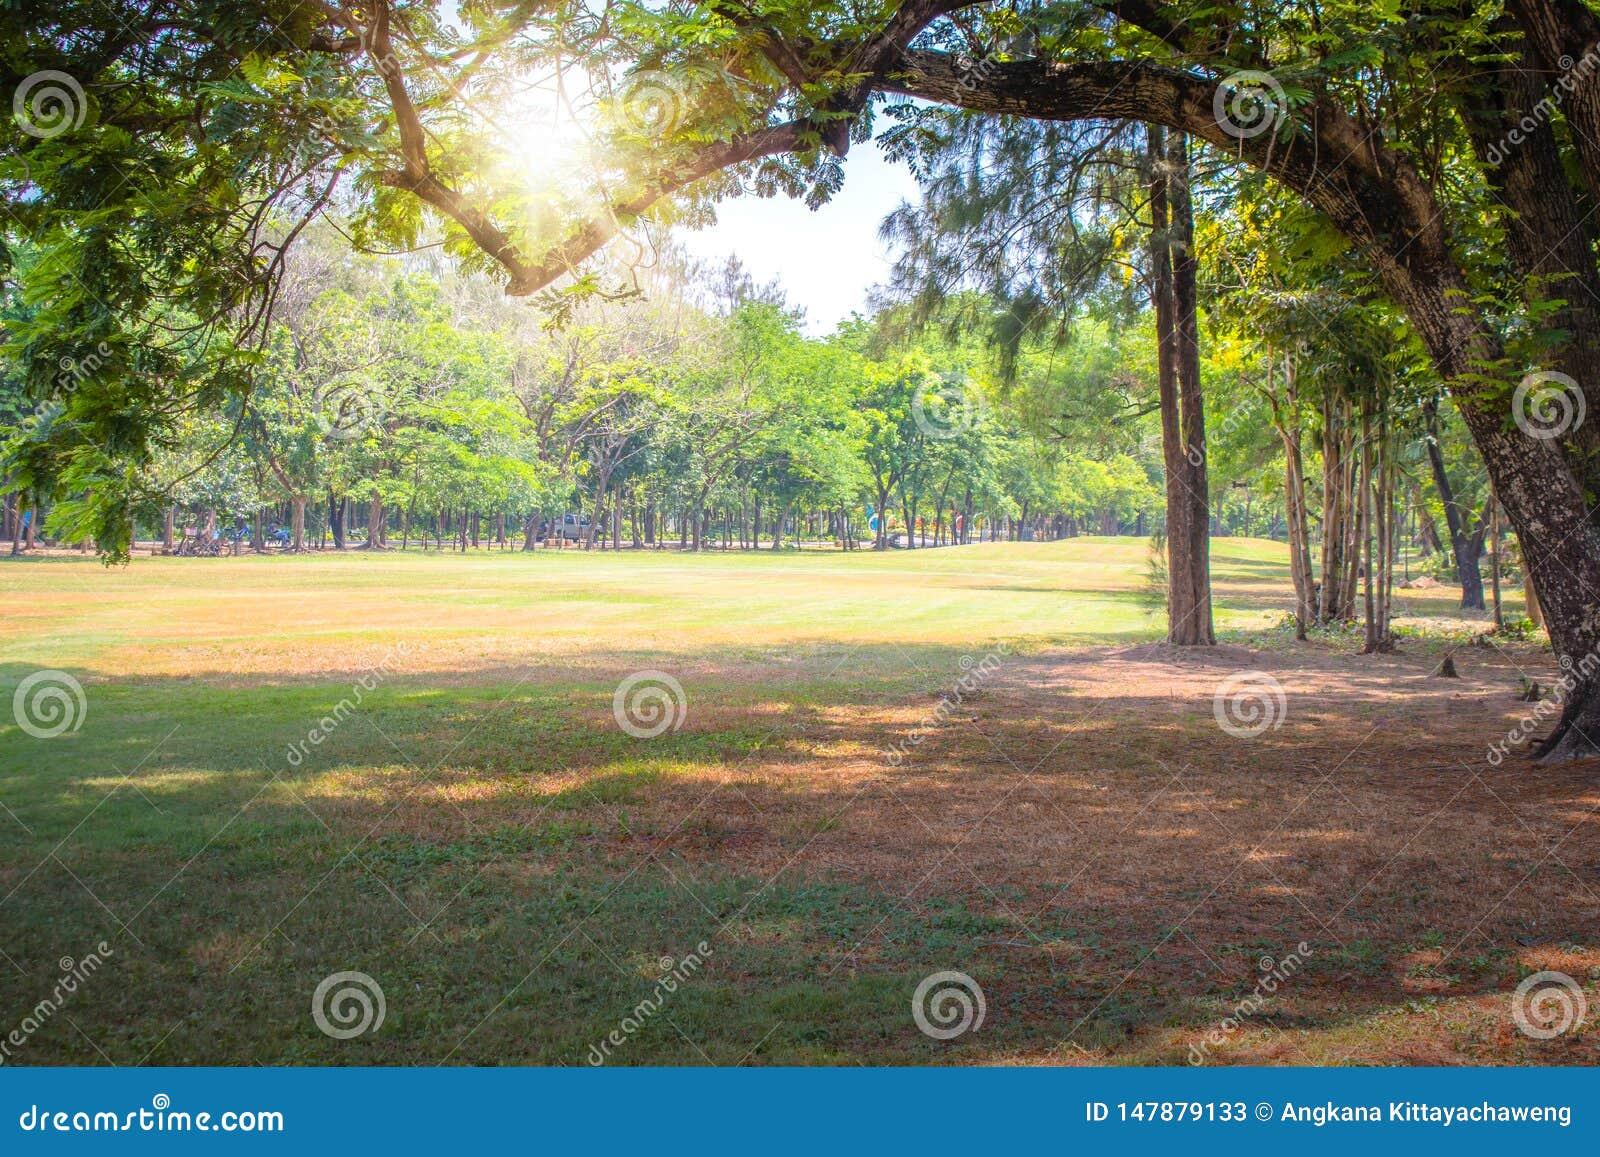 Mooie groene gazon en bomentakken in openbaar park